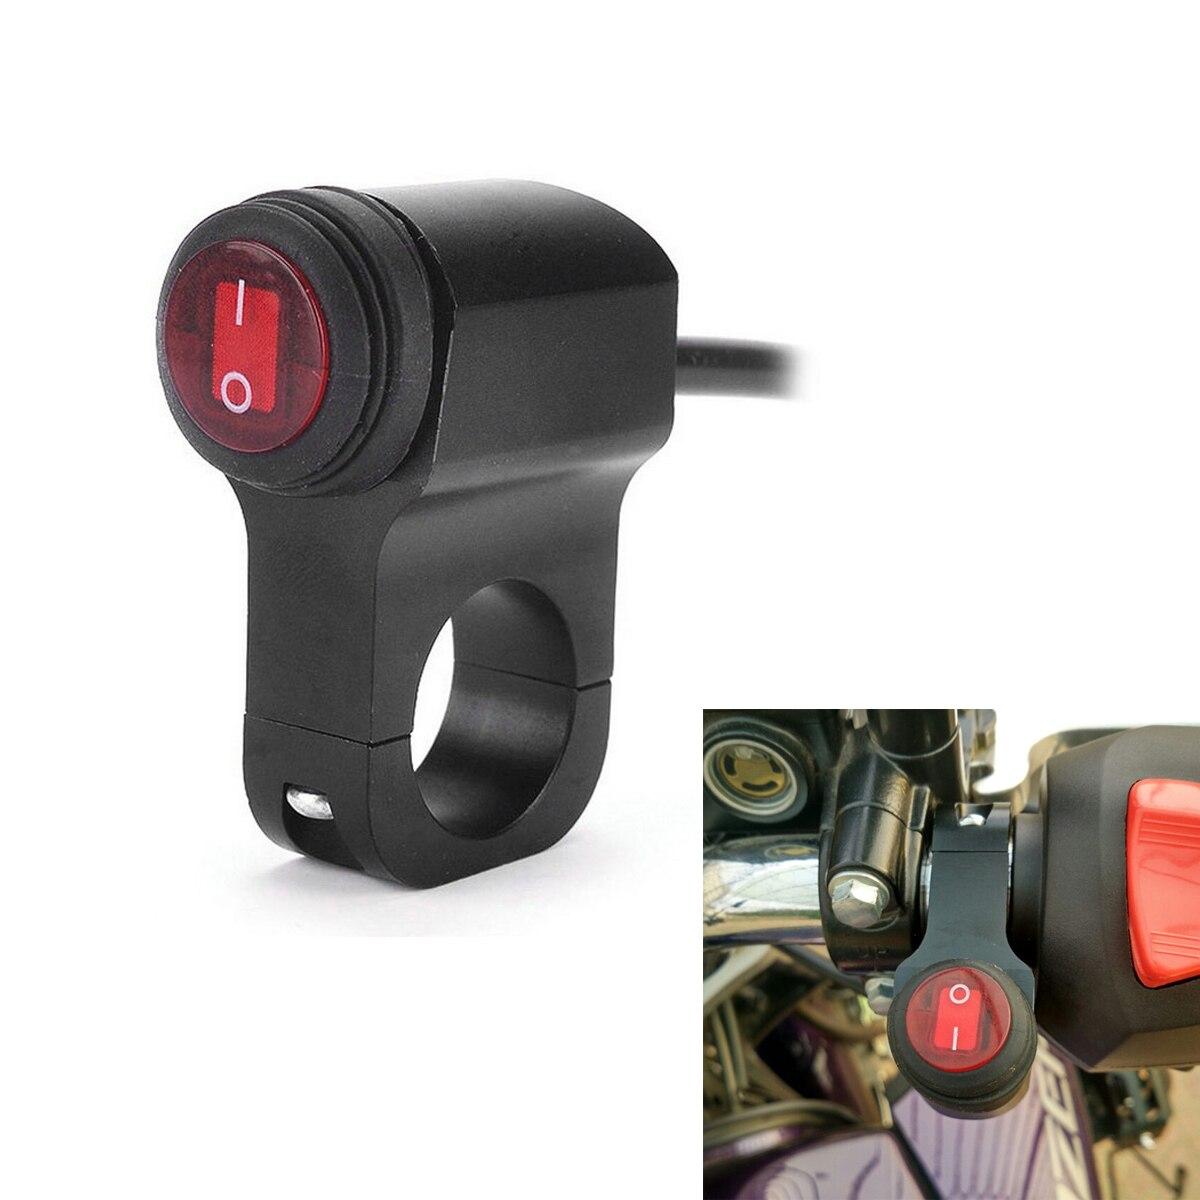 headlight switch motorcycle free ford logo aliexpress buy 12v 16a waterproof cnc